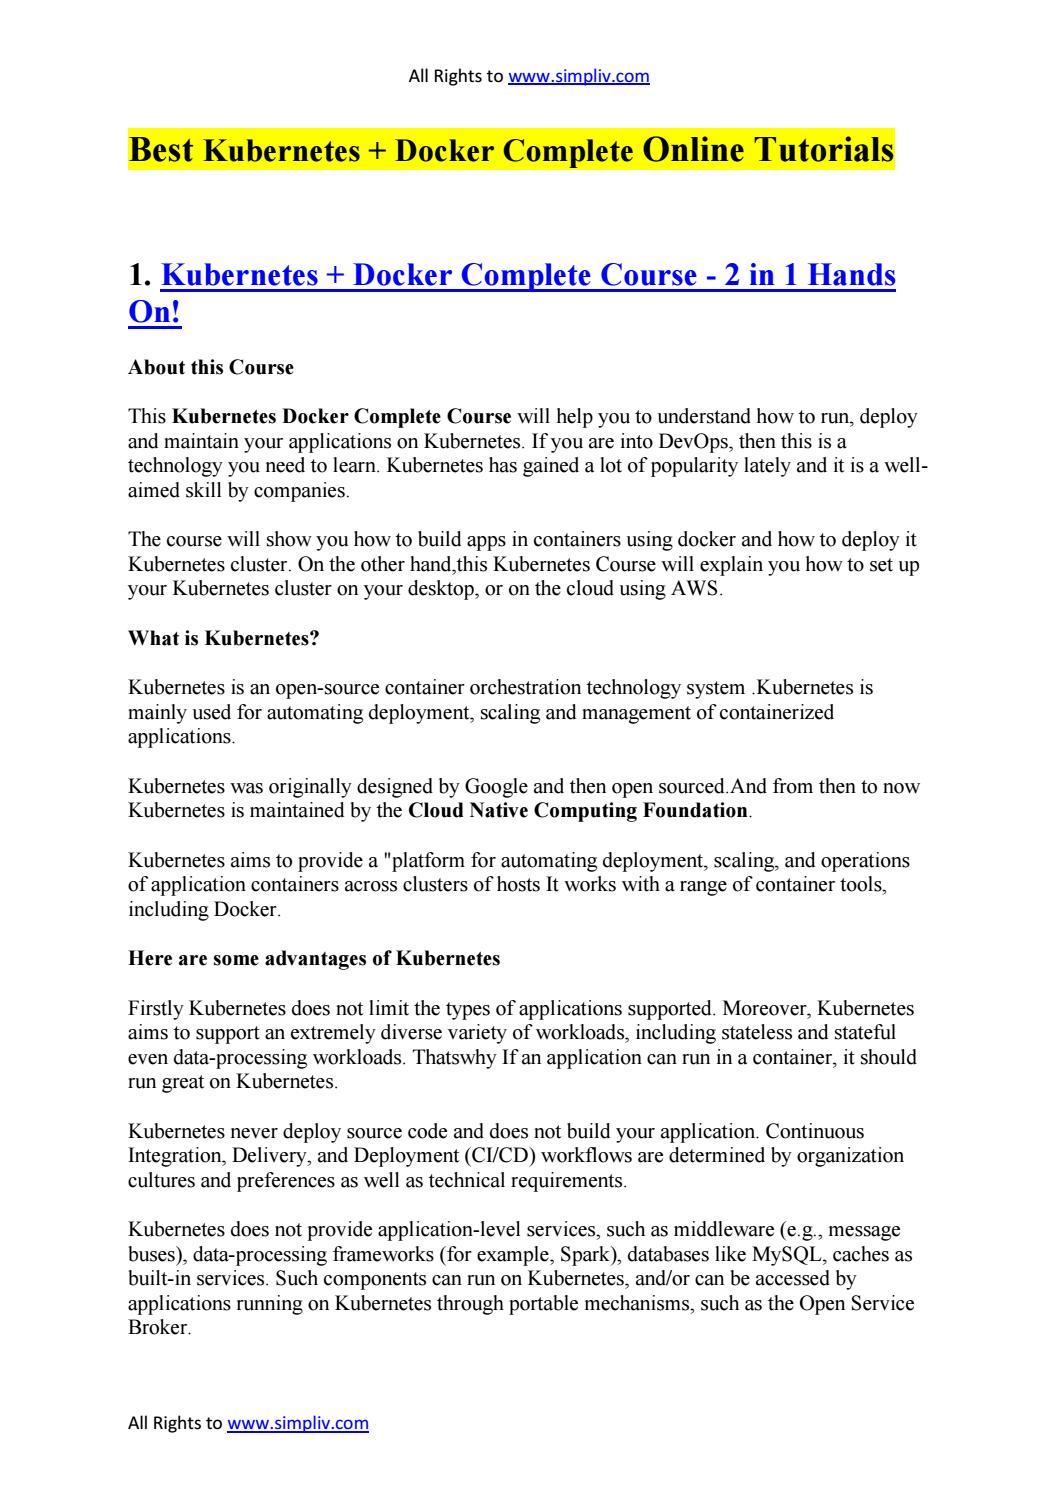 Best Kubernetes + Docker Complete Online Tutorials by